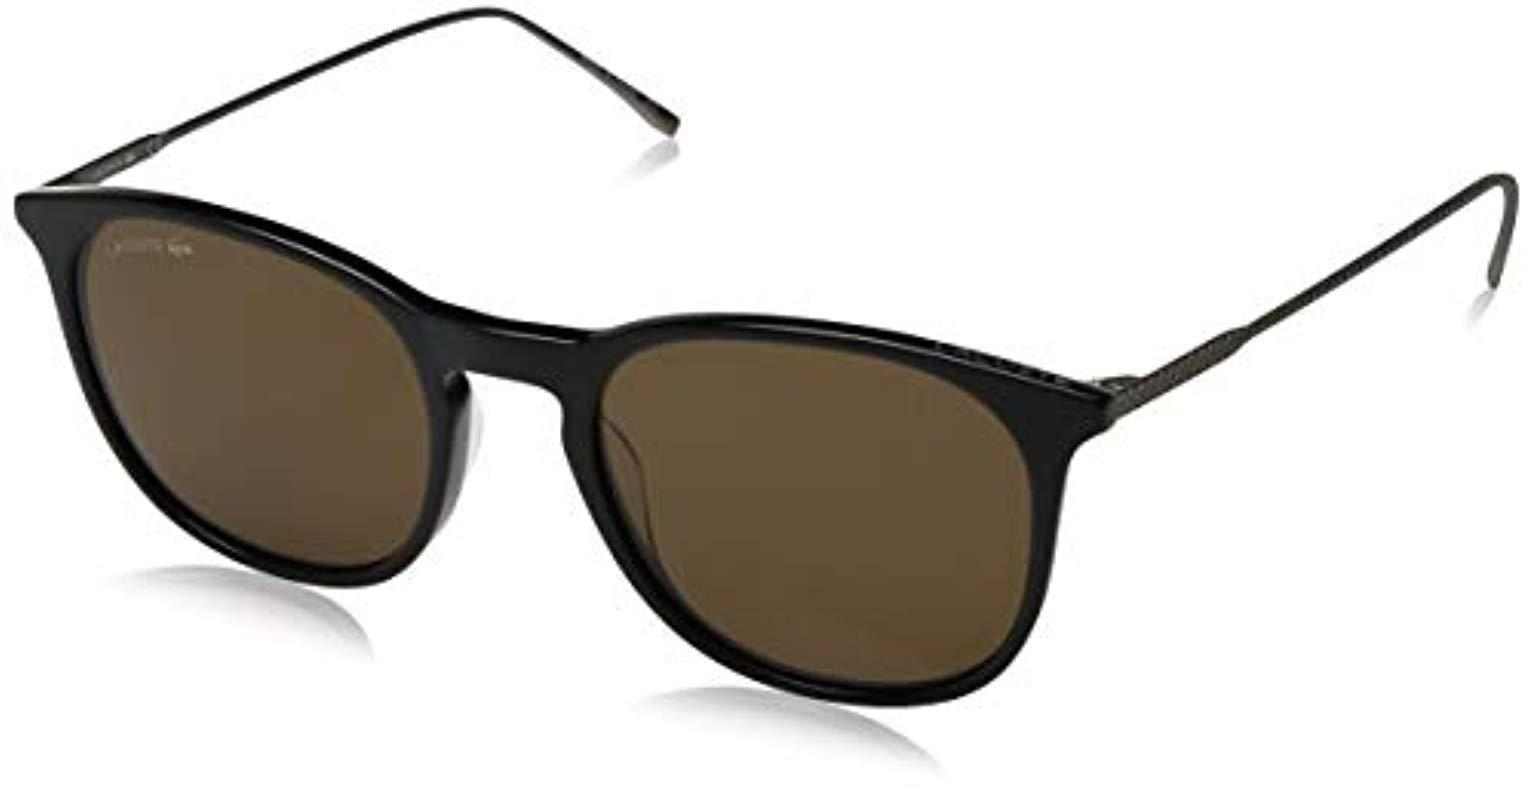 92bf525669f Lyst - Lacoste L879s Oval Sunglasses Dark Grey 52 Mm in Gray for Men